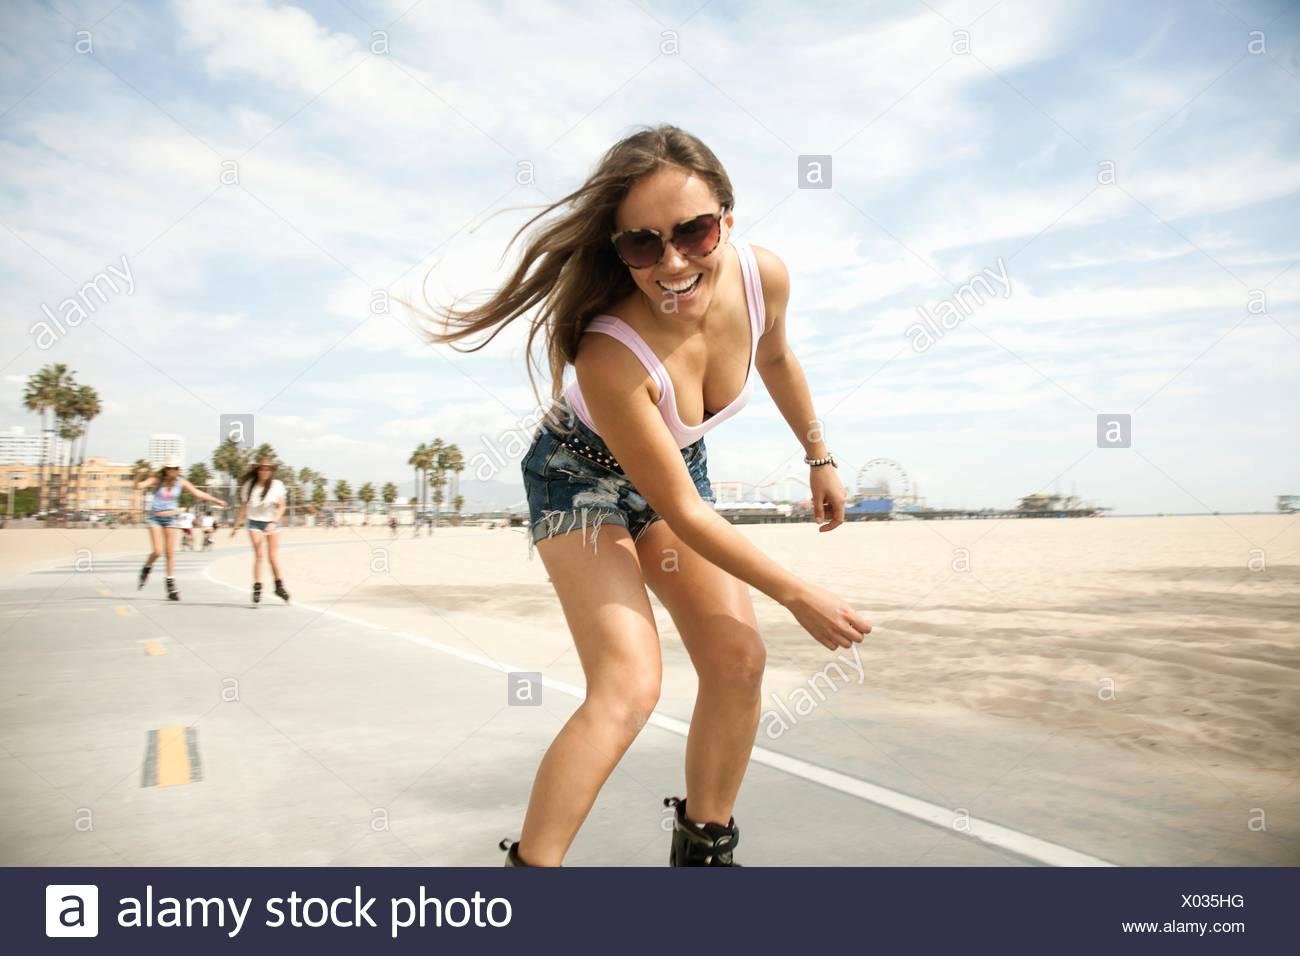 Porträt der jungen Frau, im Freien, Skaten Stockbild